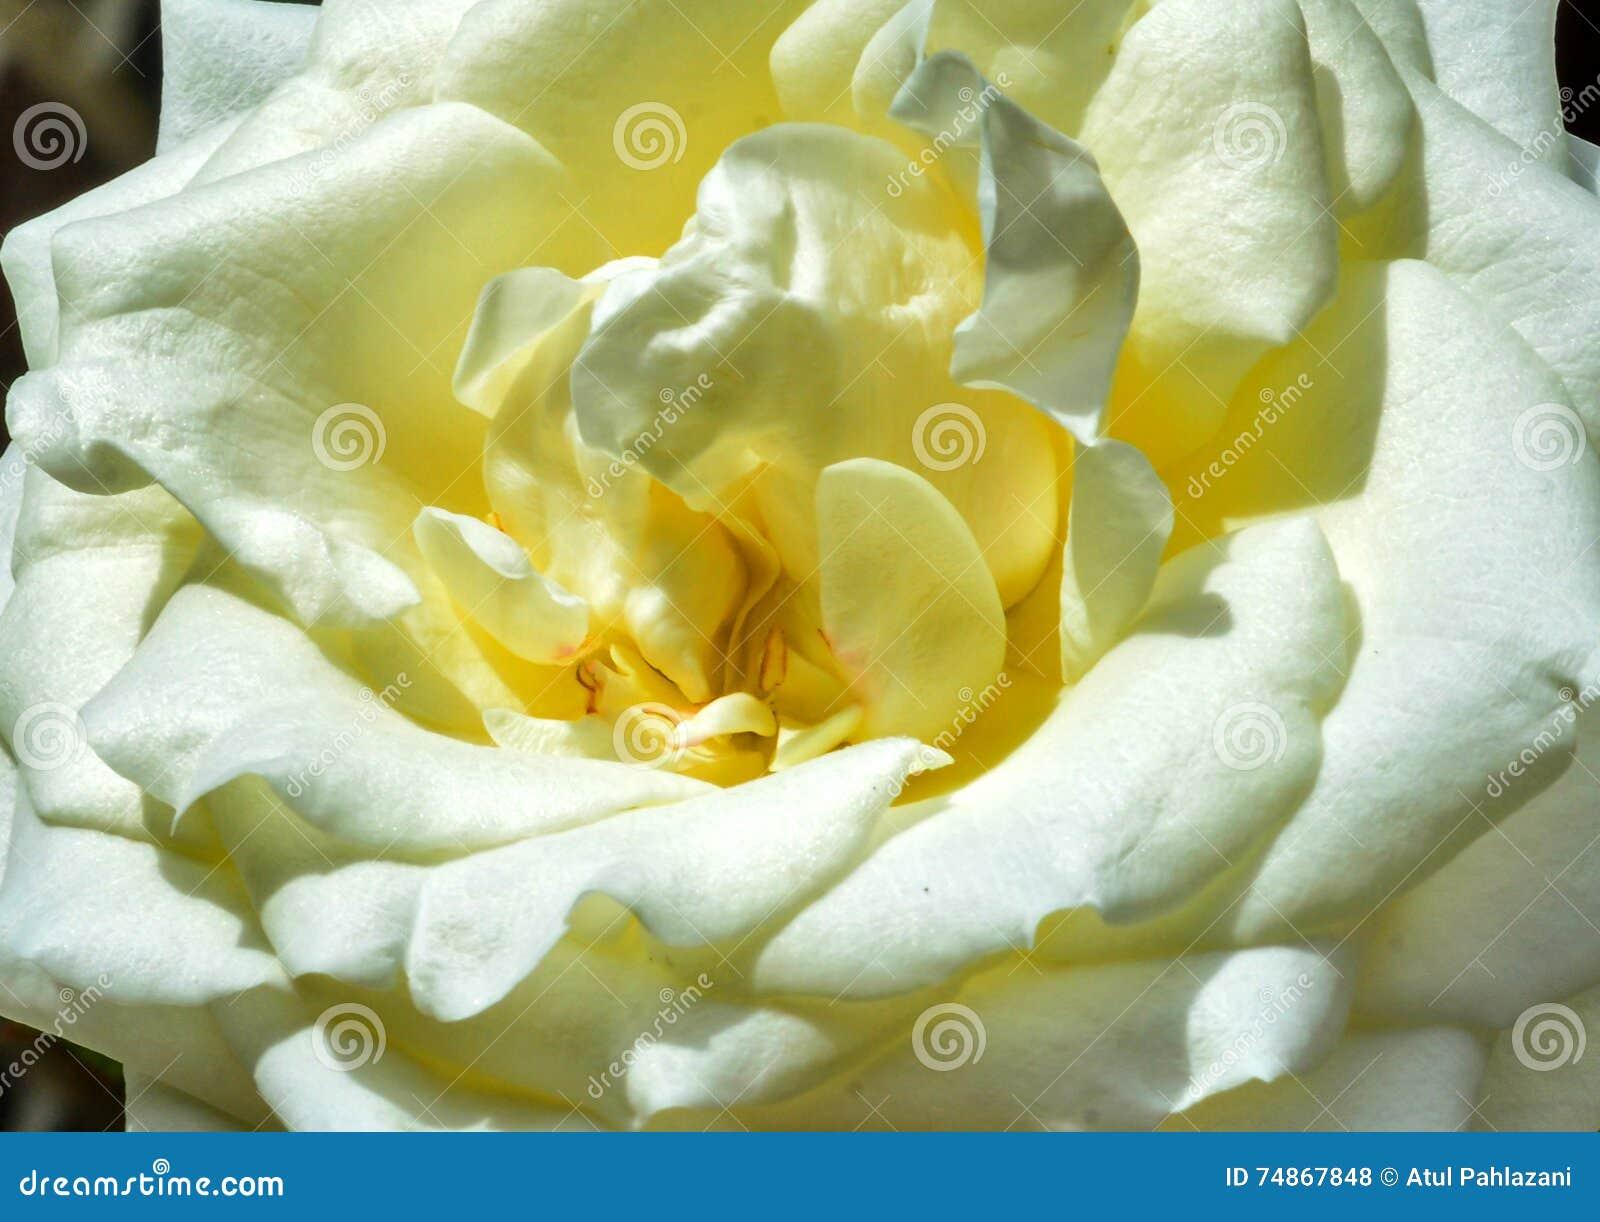 A Closeup White Rose Stock Photo Image Of Petals Closeup 74867848